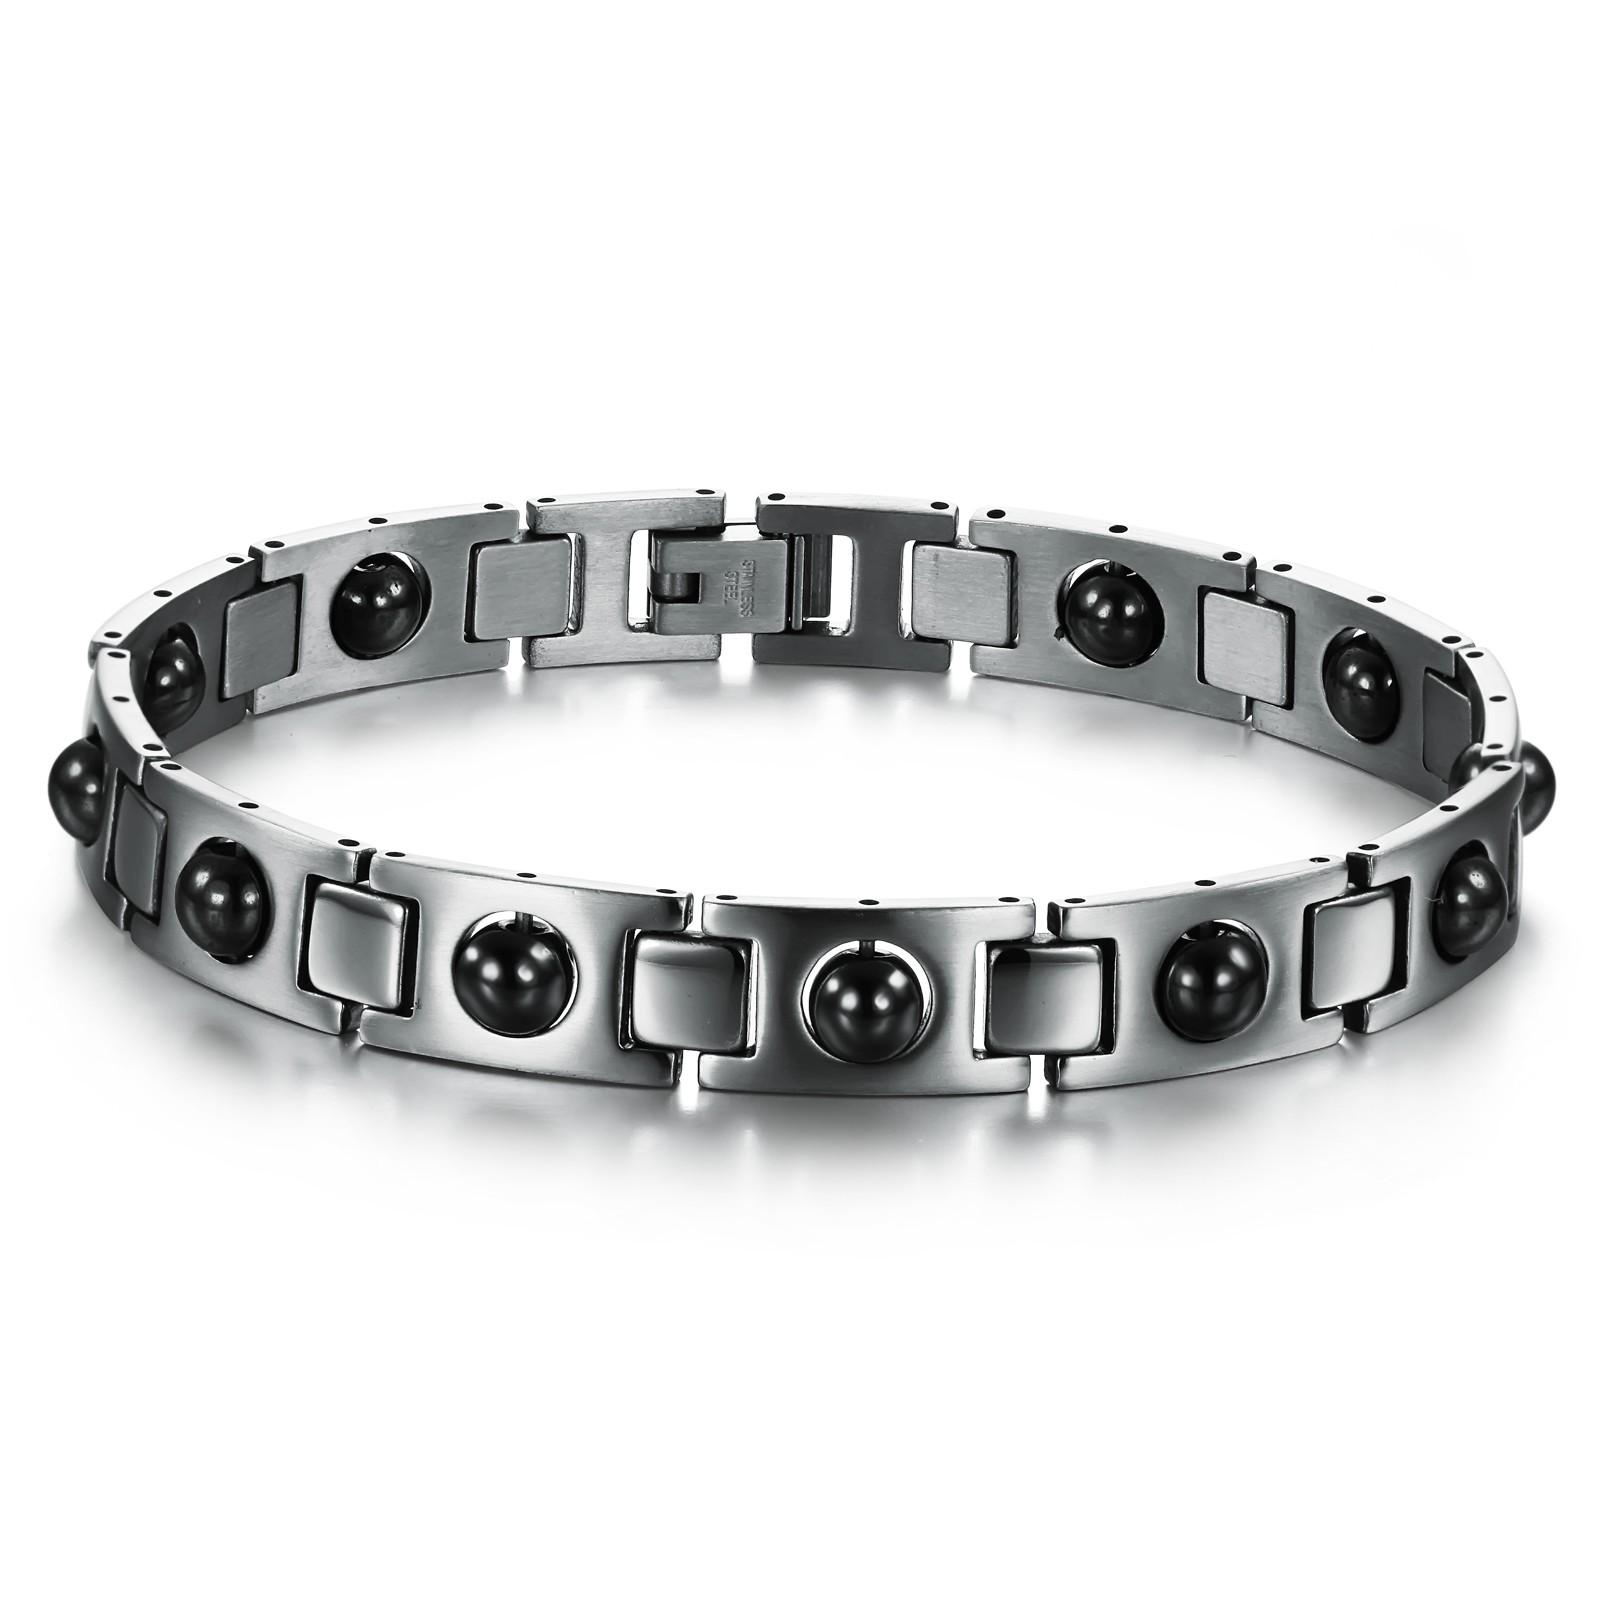 belt magnetic health care bracelet titanium gs635 - CN Jewelry Trade Co., Ltd. store